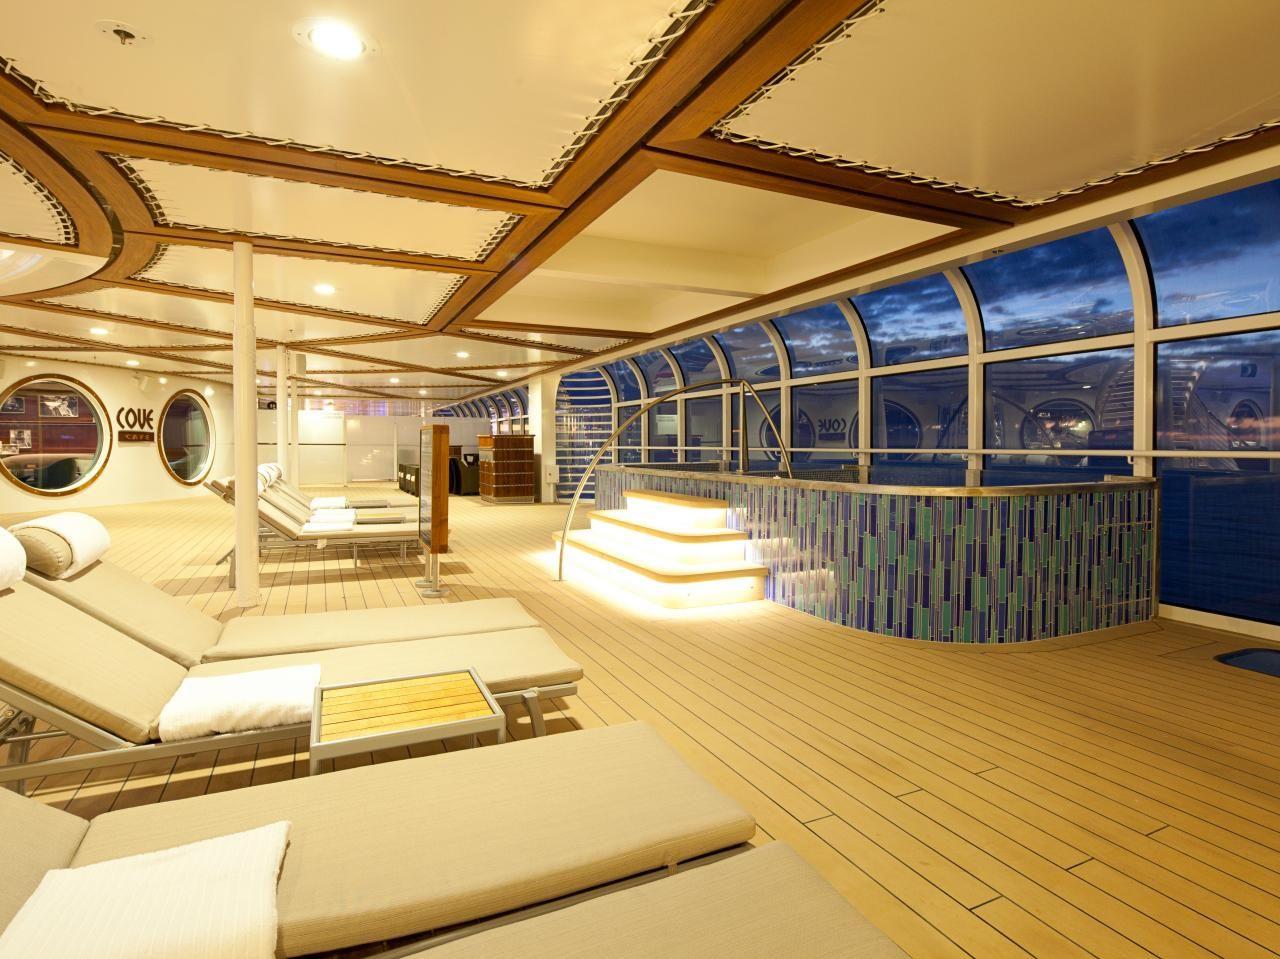 Take An All-Access Tour Of The Disney Dream Cruise Ship